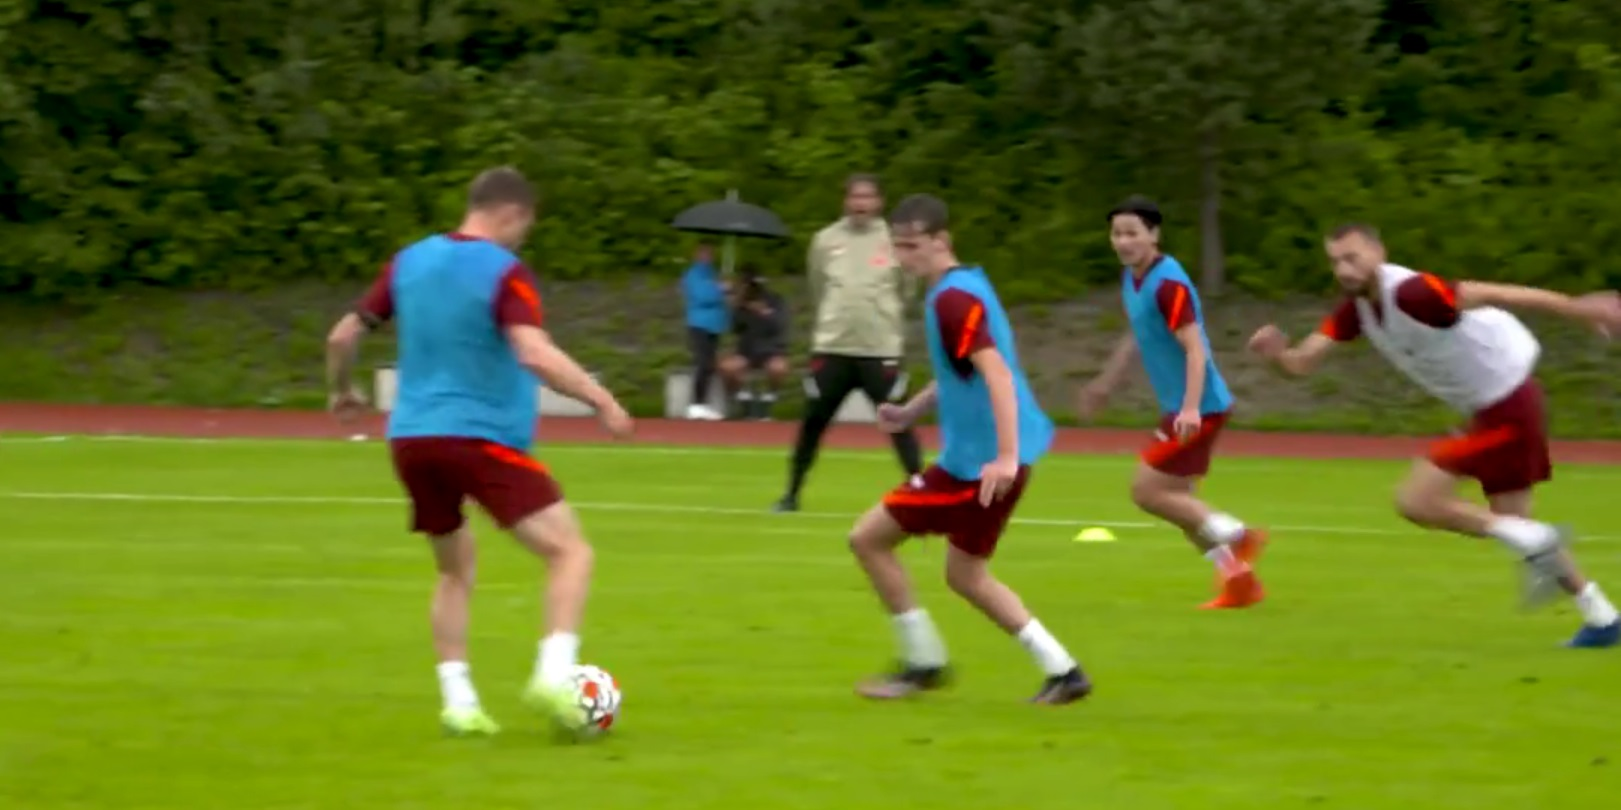 "(Video) ""Taki!"" – Liverpool coach buzzes as Minamino scores goal in training"